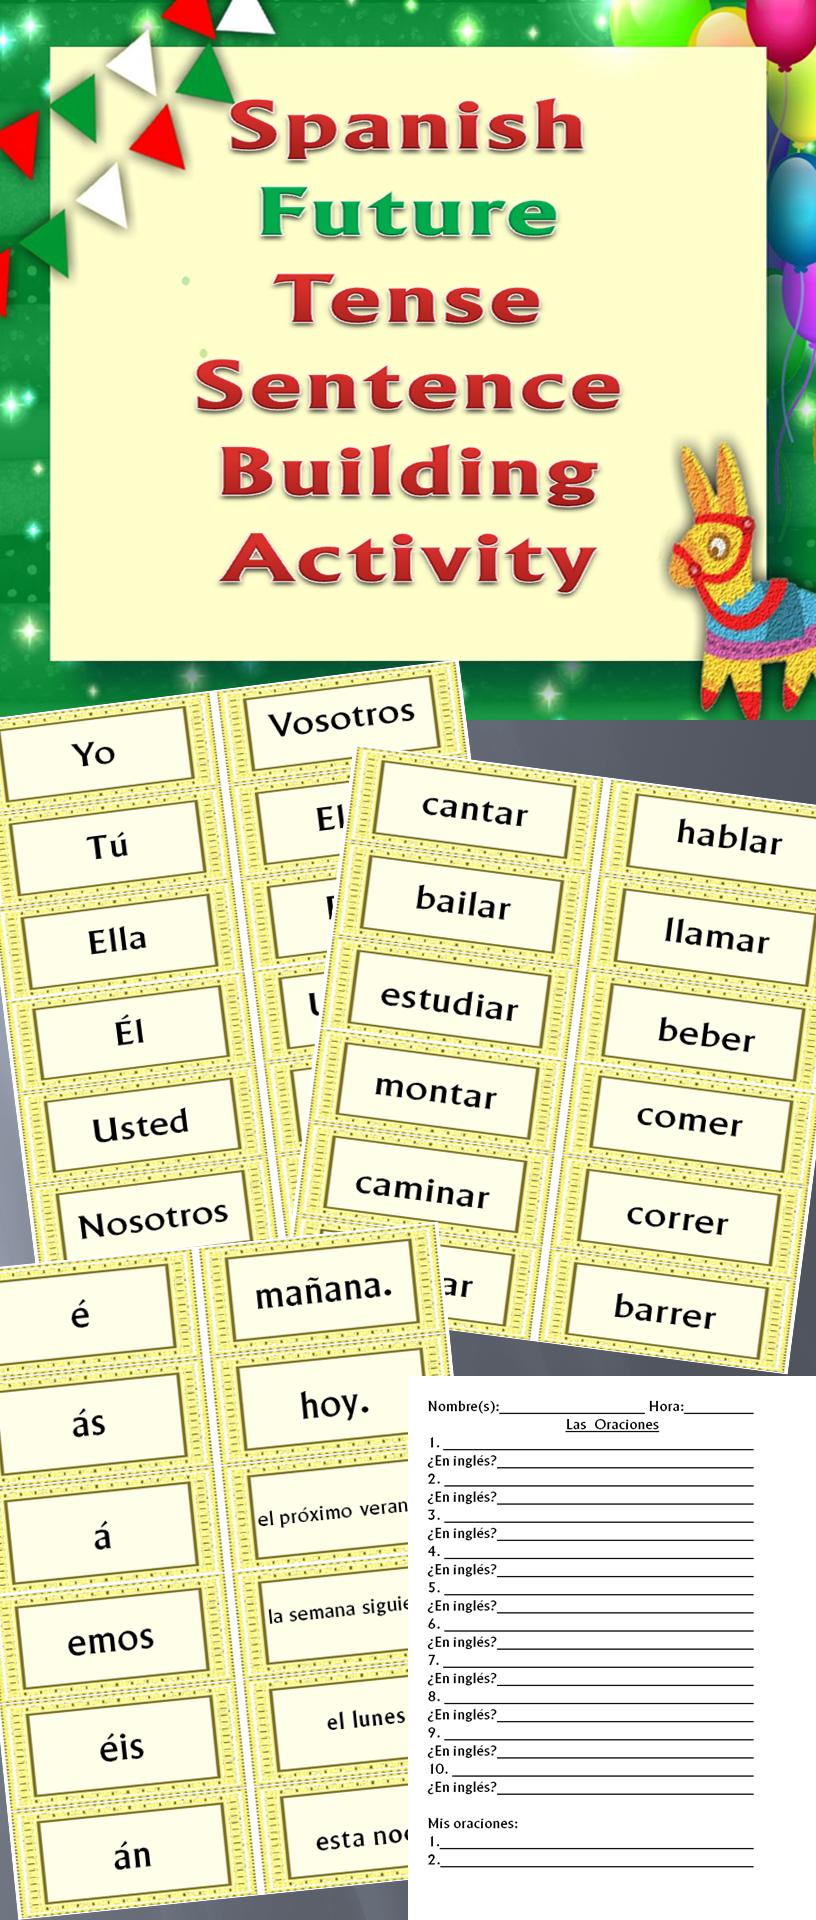 Hands On Activity Making Future Tense Sentences In Spanish Spanish Classroom Activities Spanish Students Spanish Help [ 1920 x 816 Pixel ]